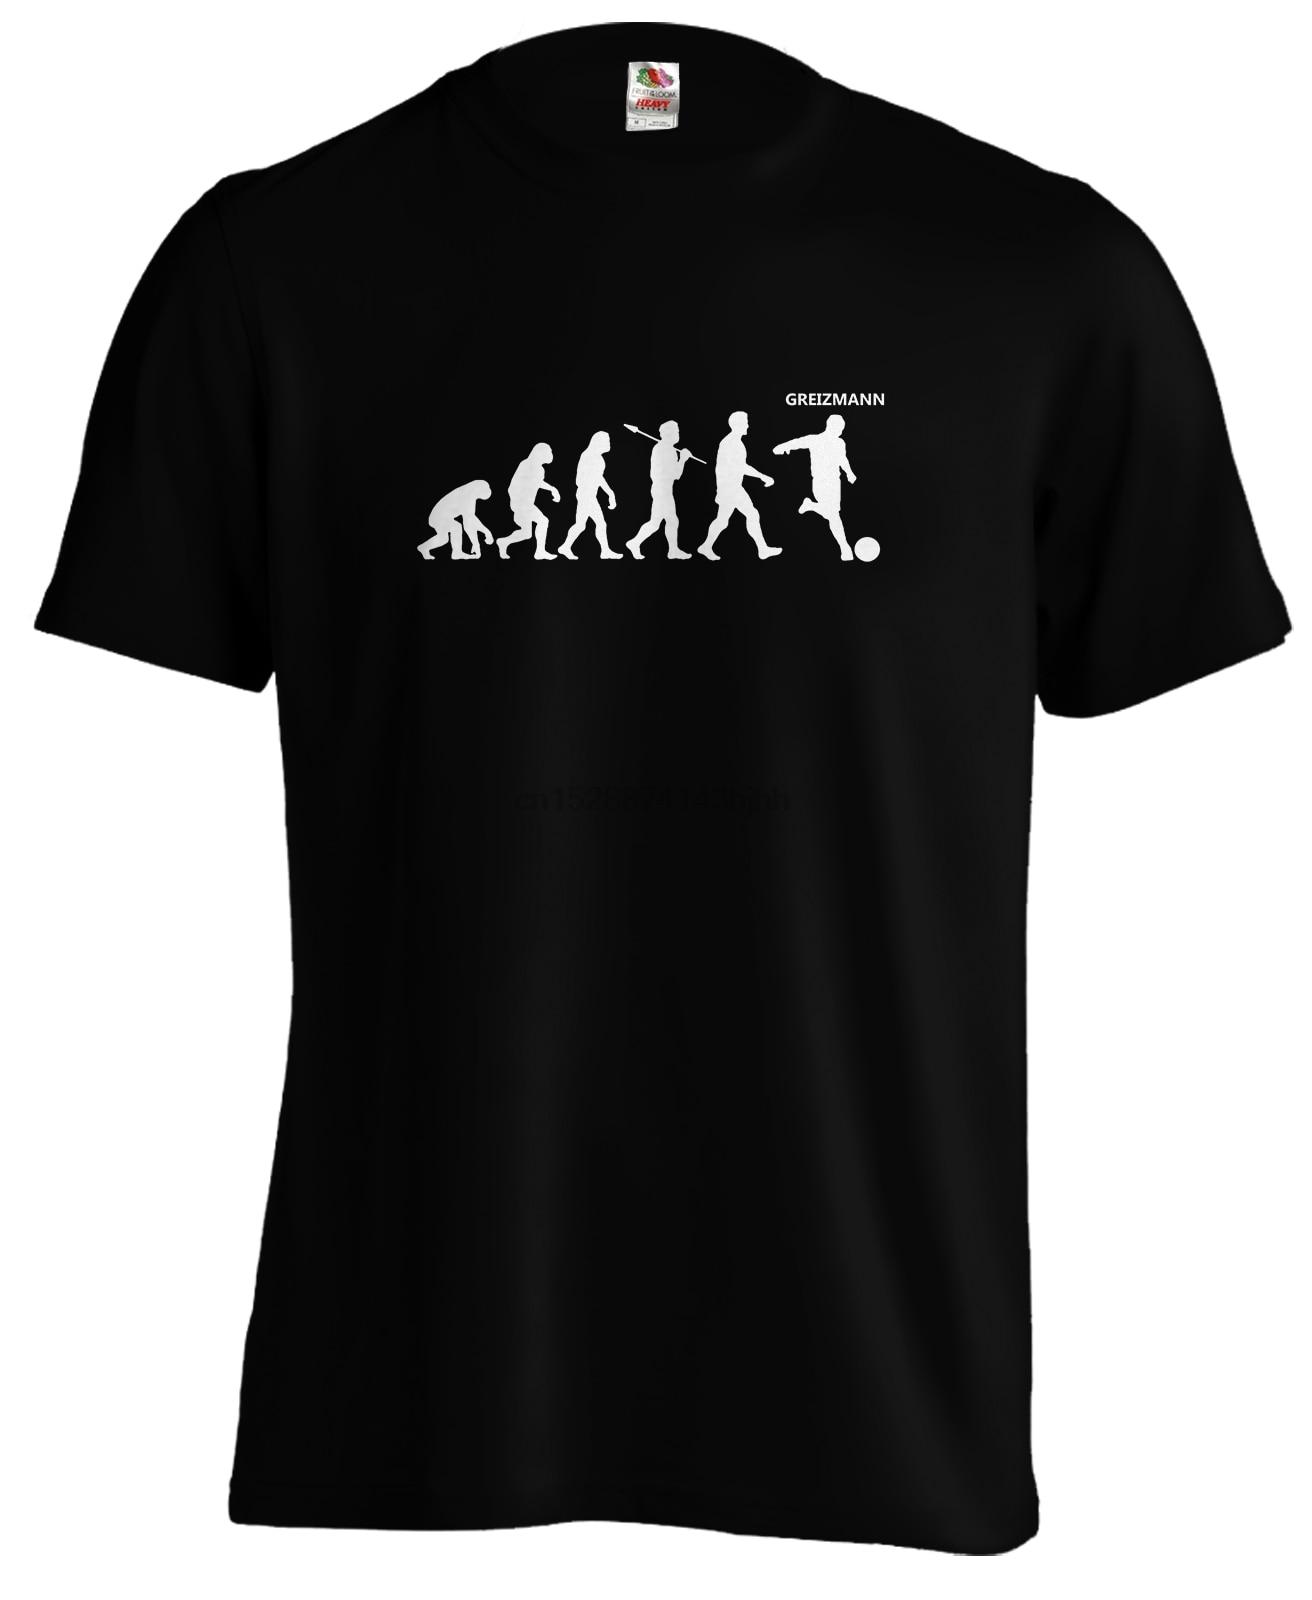 Antoine Griezmann-evolución Evo camiseta-Fútbol-Atltico Madrid